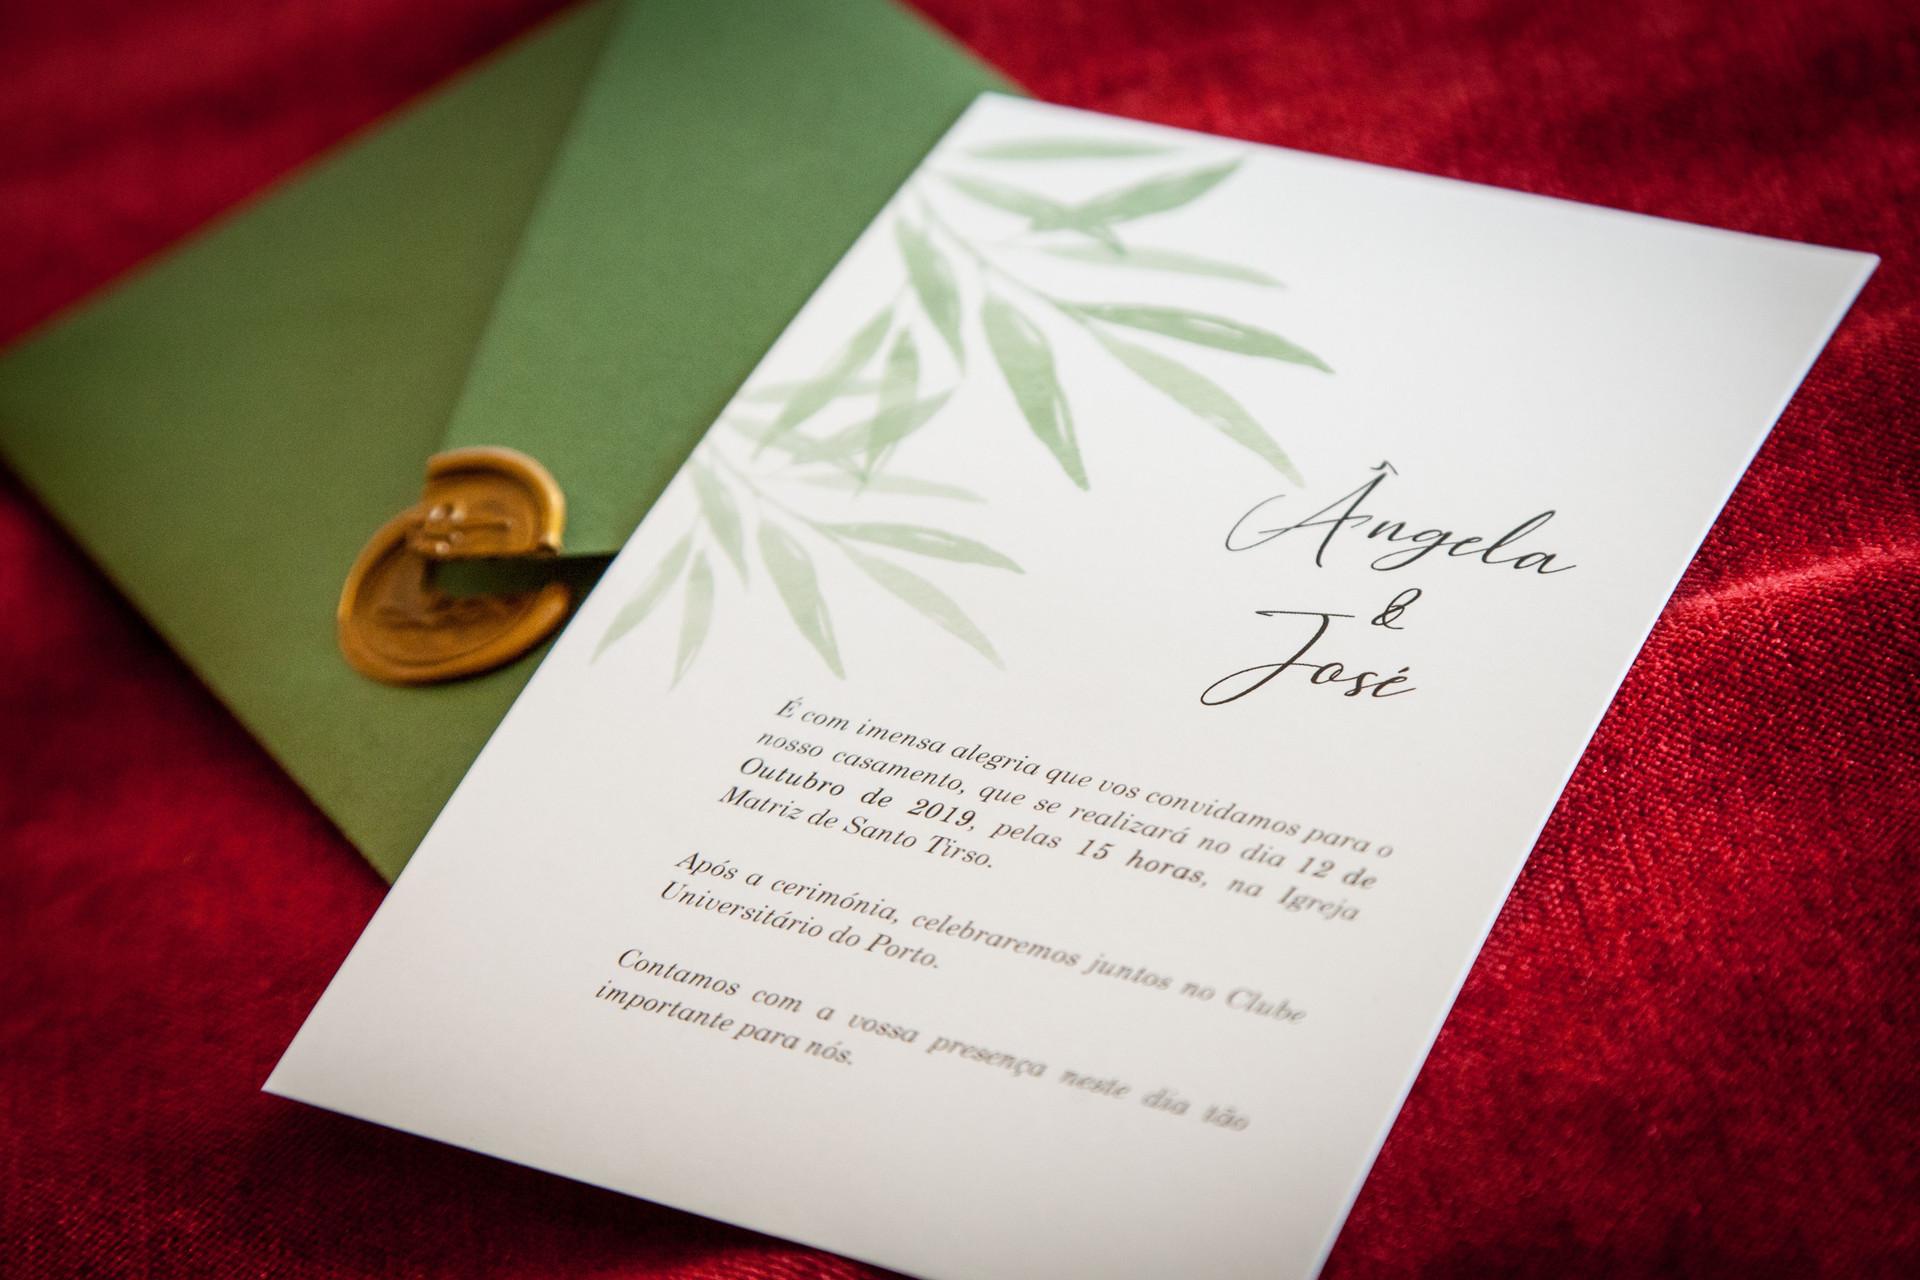 Casamento-AngelaJose-Final (168).JPG